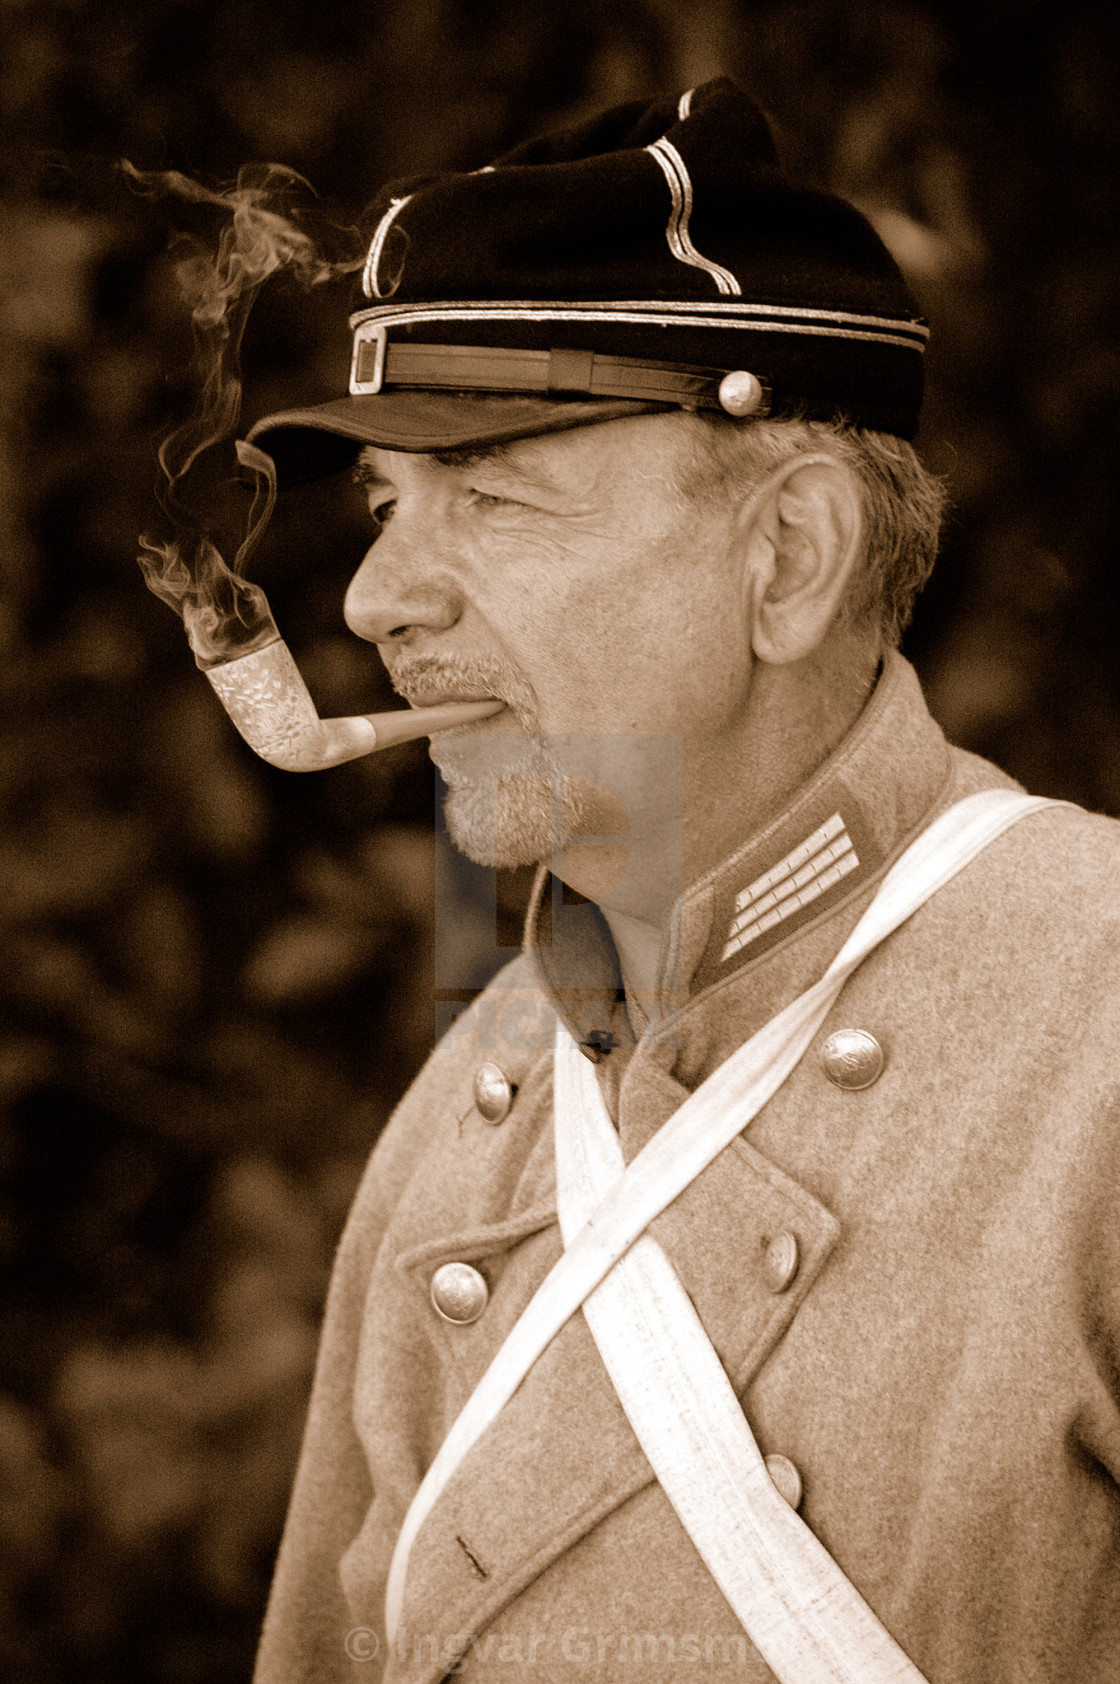 """Civil War Soldier Smoking a Pipe"" stock image"